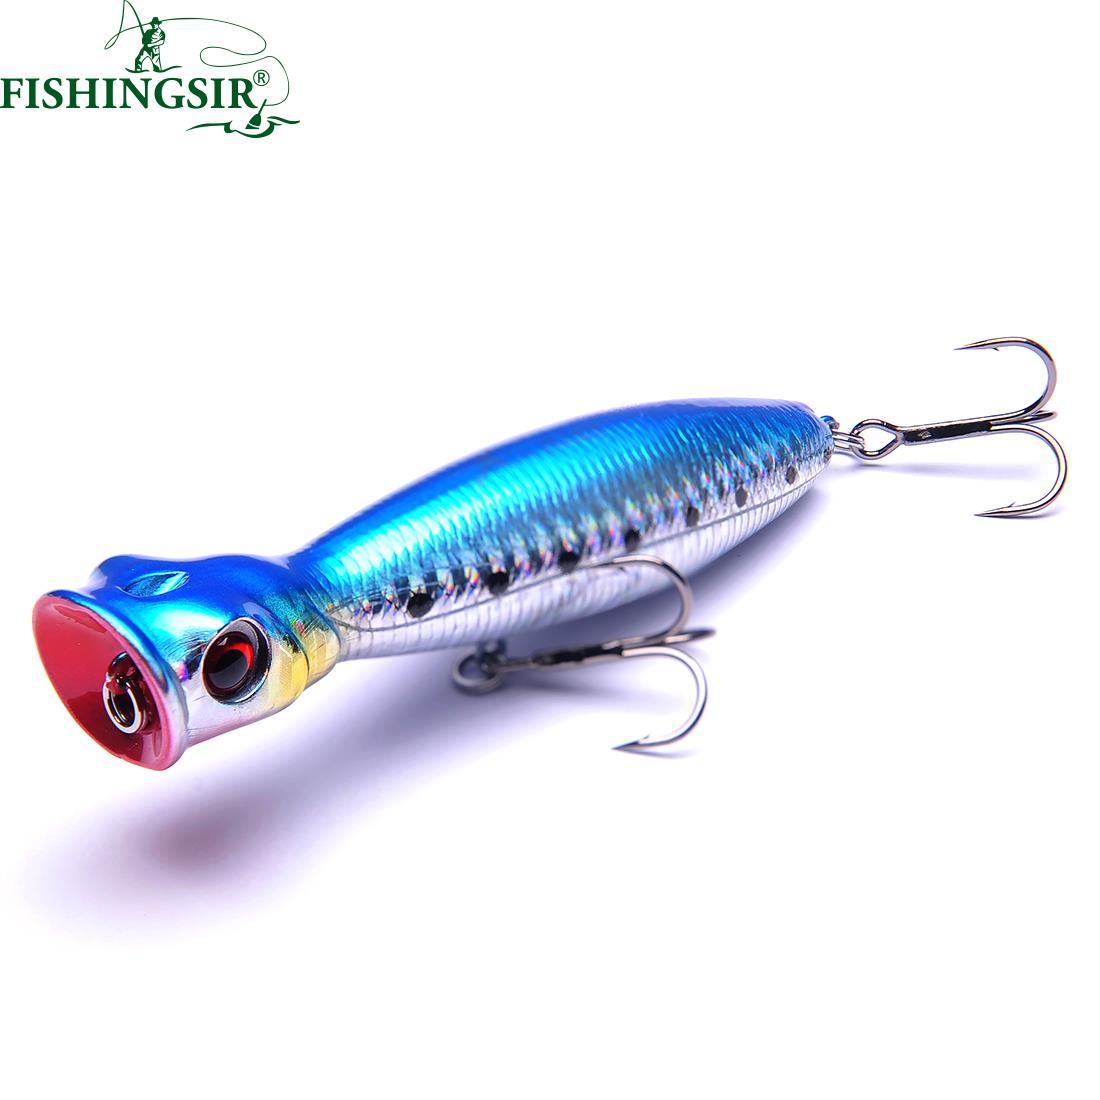 Isca Artificial Big Mouth Popper Fishing Lures 10cm/16g 13cm/36g 8cm/9.5g Topwater Floating Lure Hooks Bait Crankbait halco roosta popper 80 r18 80mm 16g 0m f